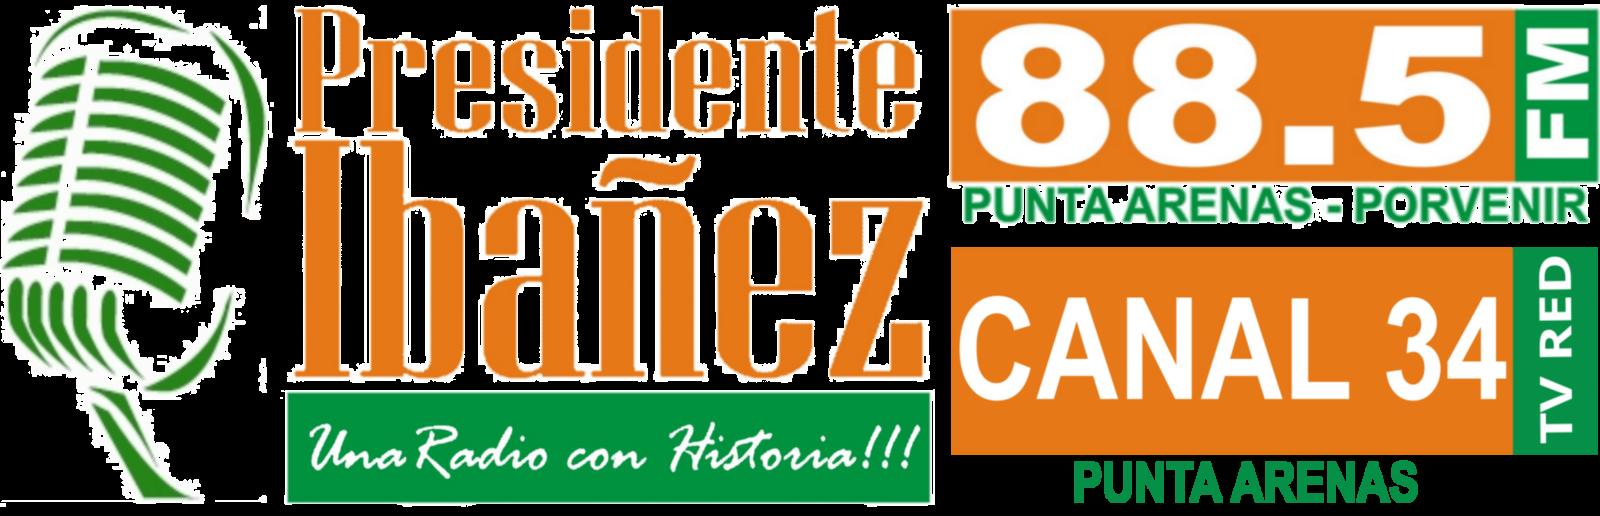 PRESIDENTE IBAÑEZ